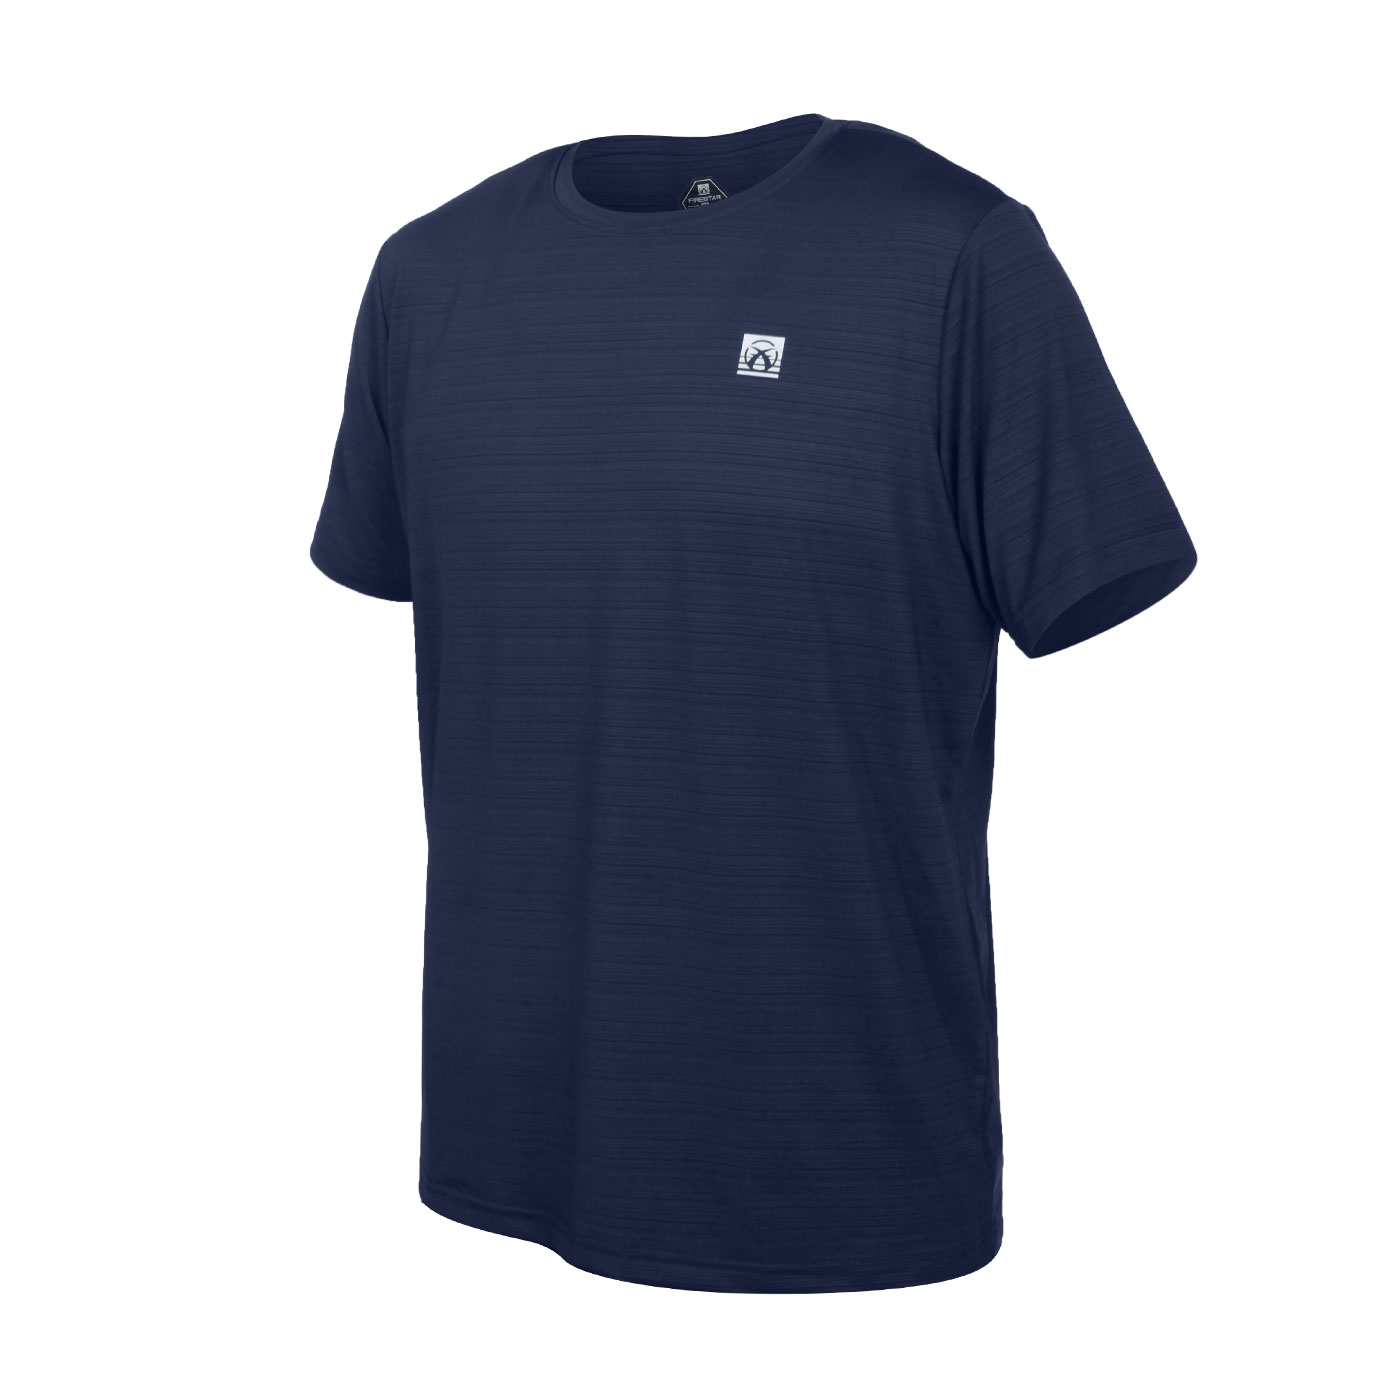 FIRESTAR 男彈性機能短袖圓領T恤 D1733-93 - 丈青銀